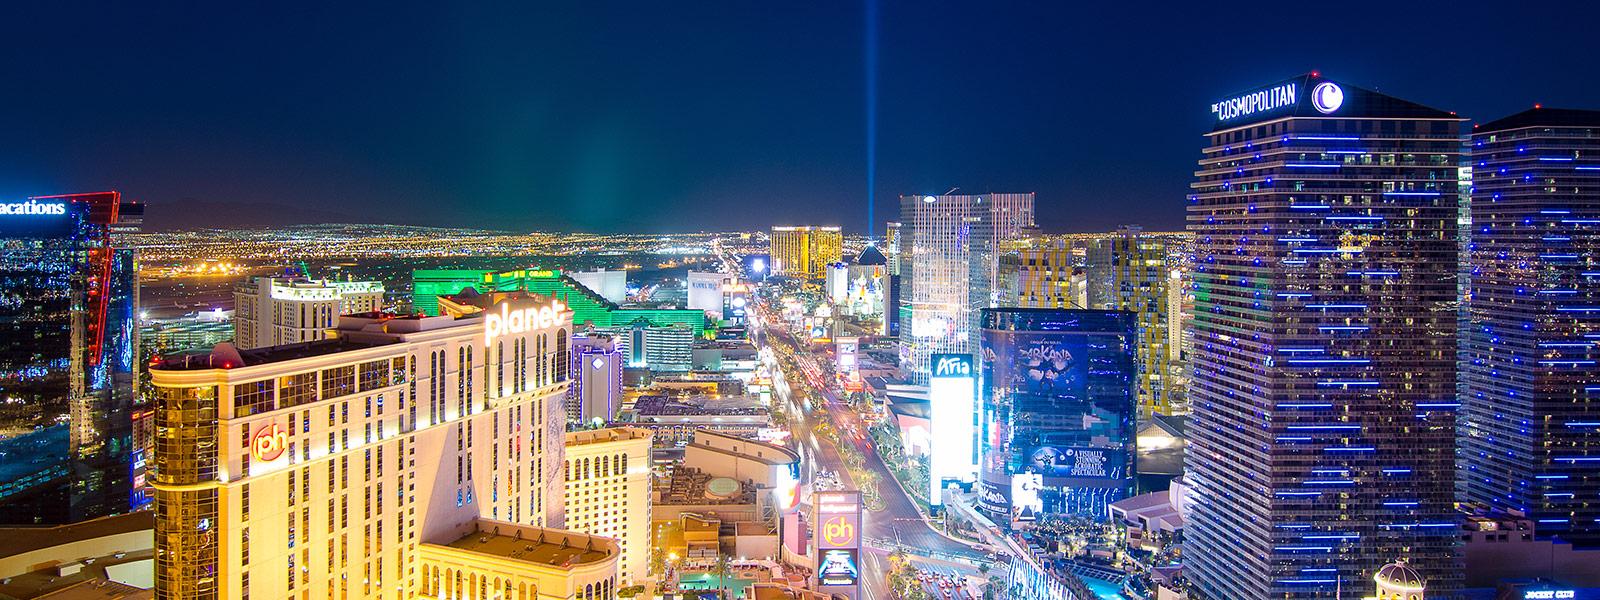 Las Vegas Probation Violation Lawyers | Probation Violation